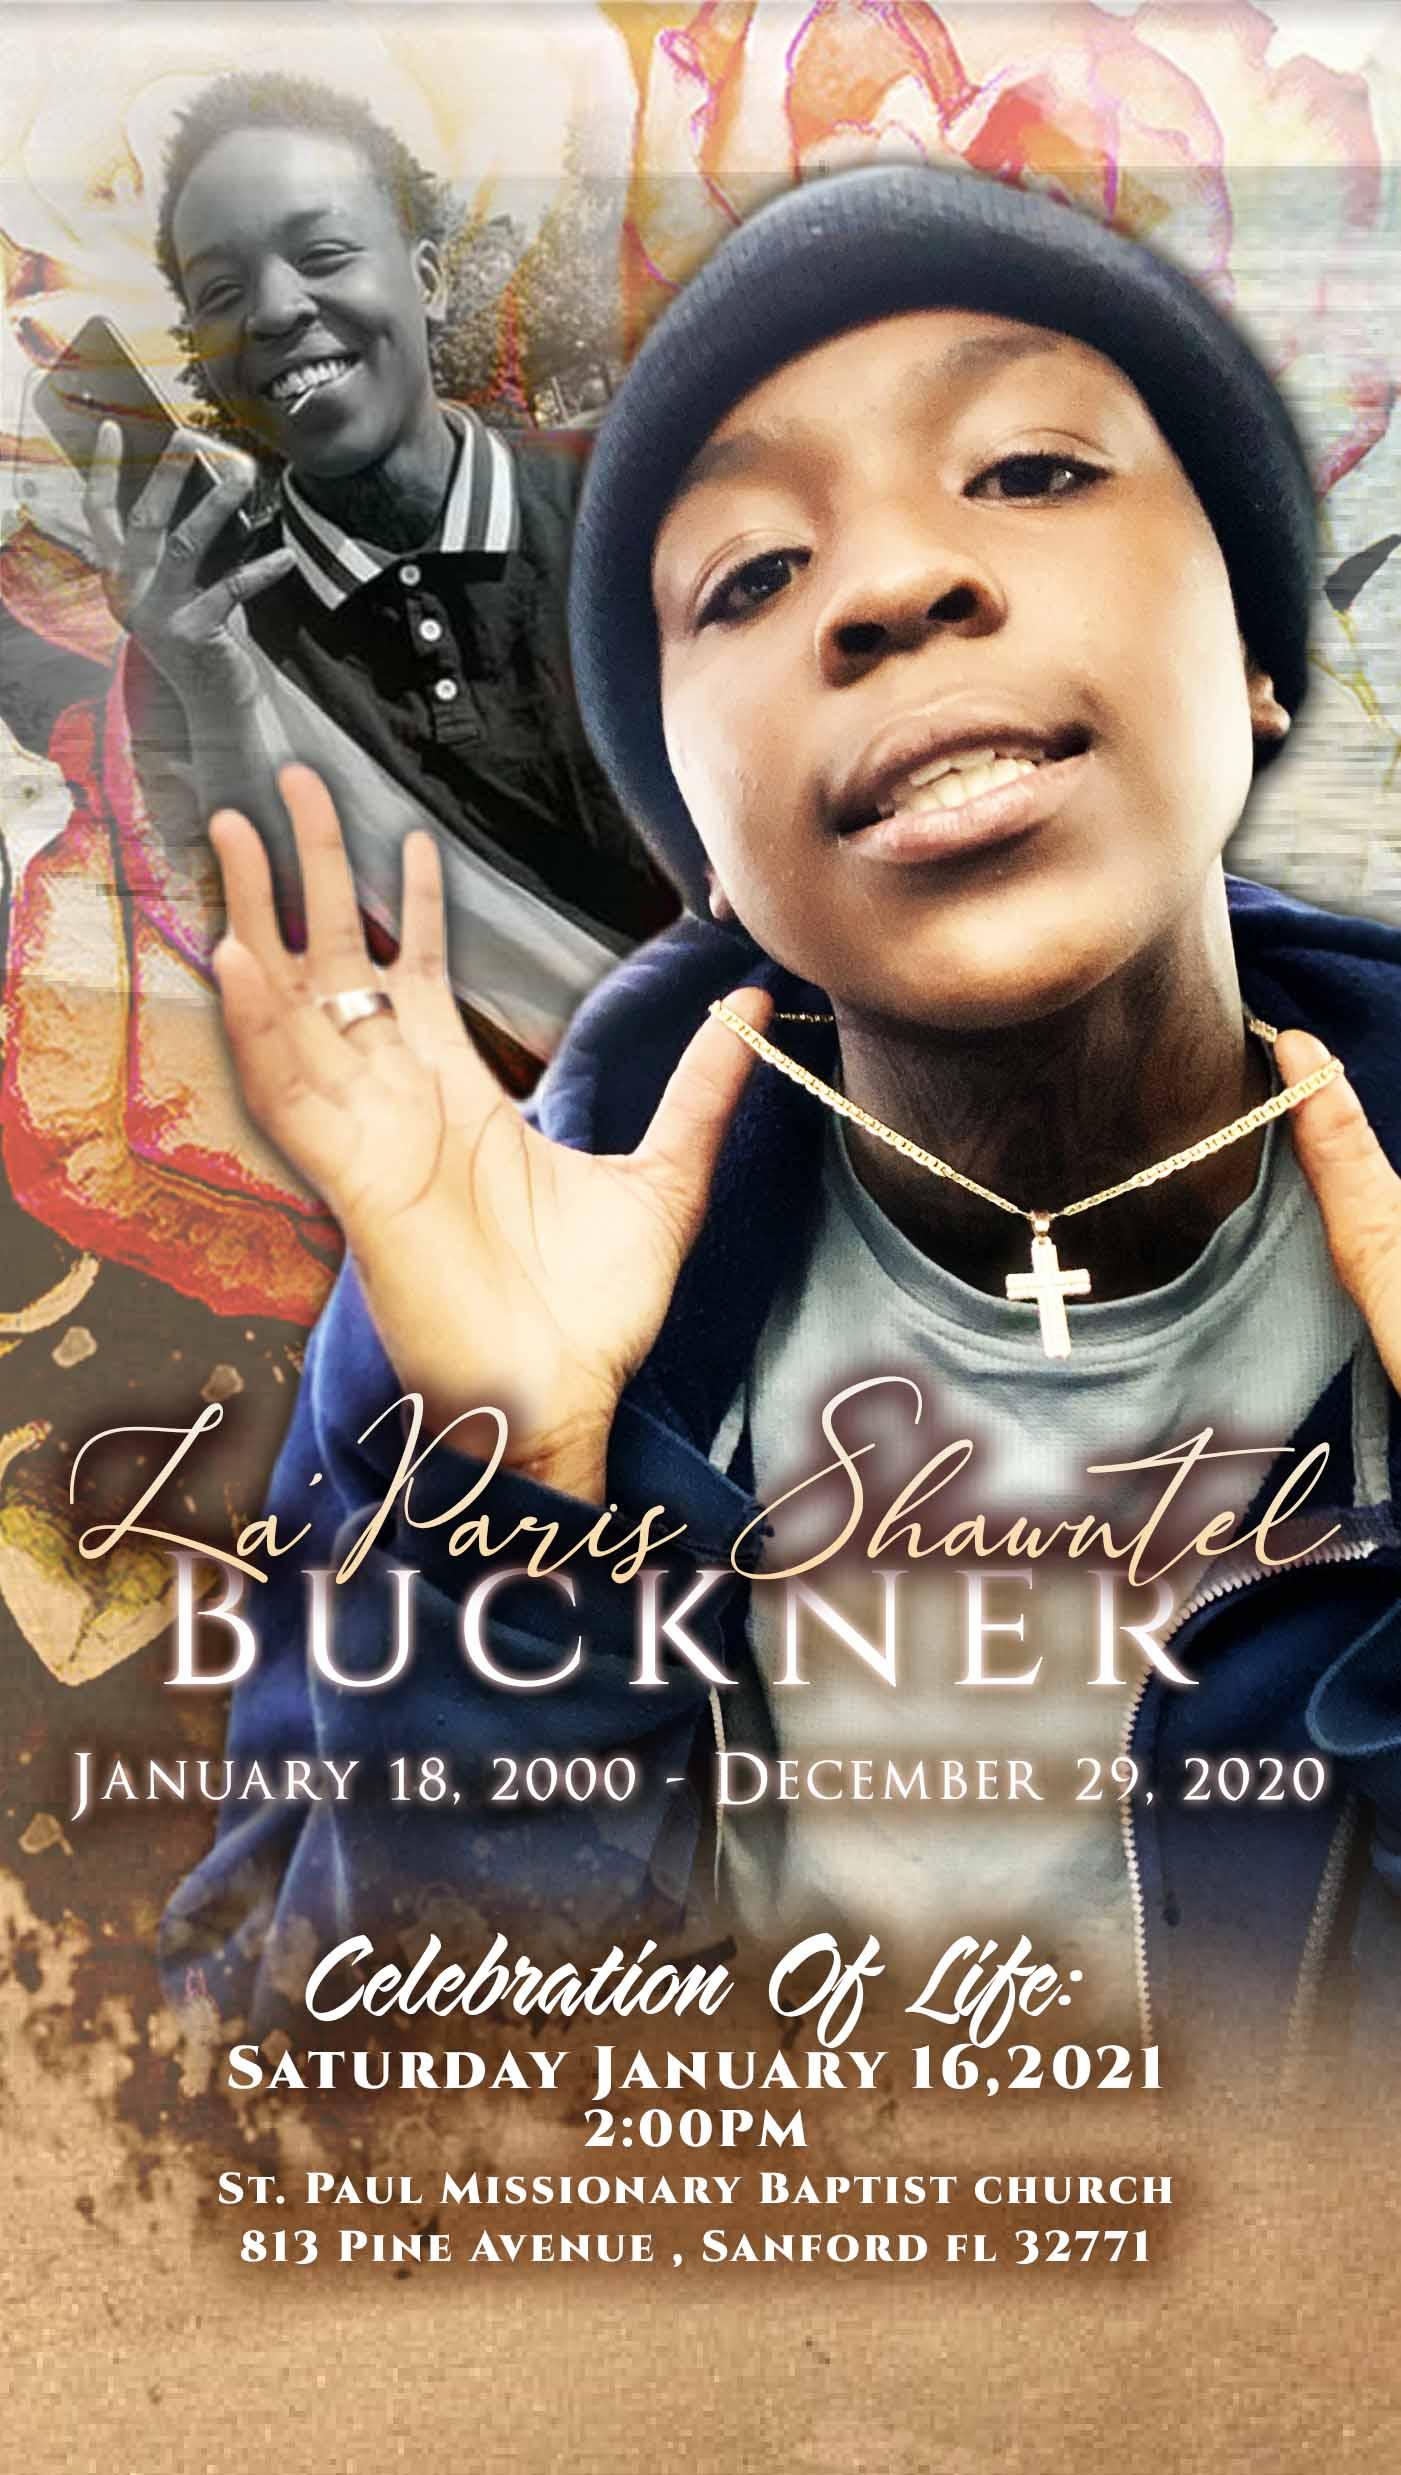 La Paris Shantel Buckner 2000-2020